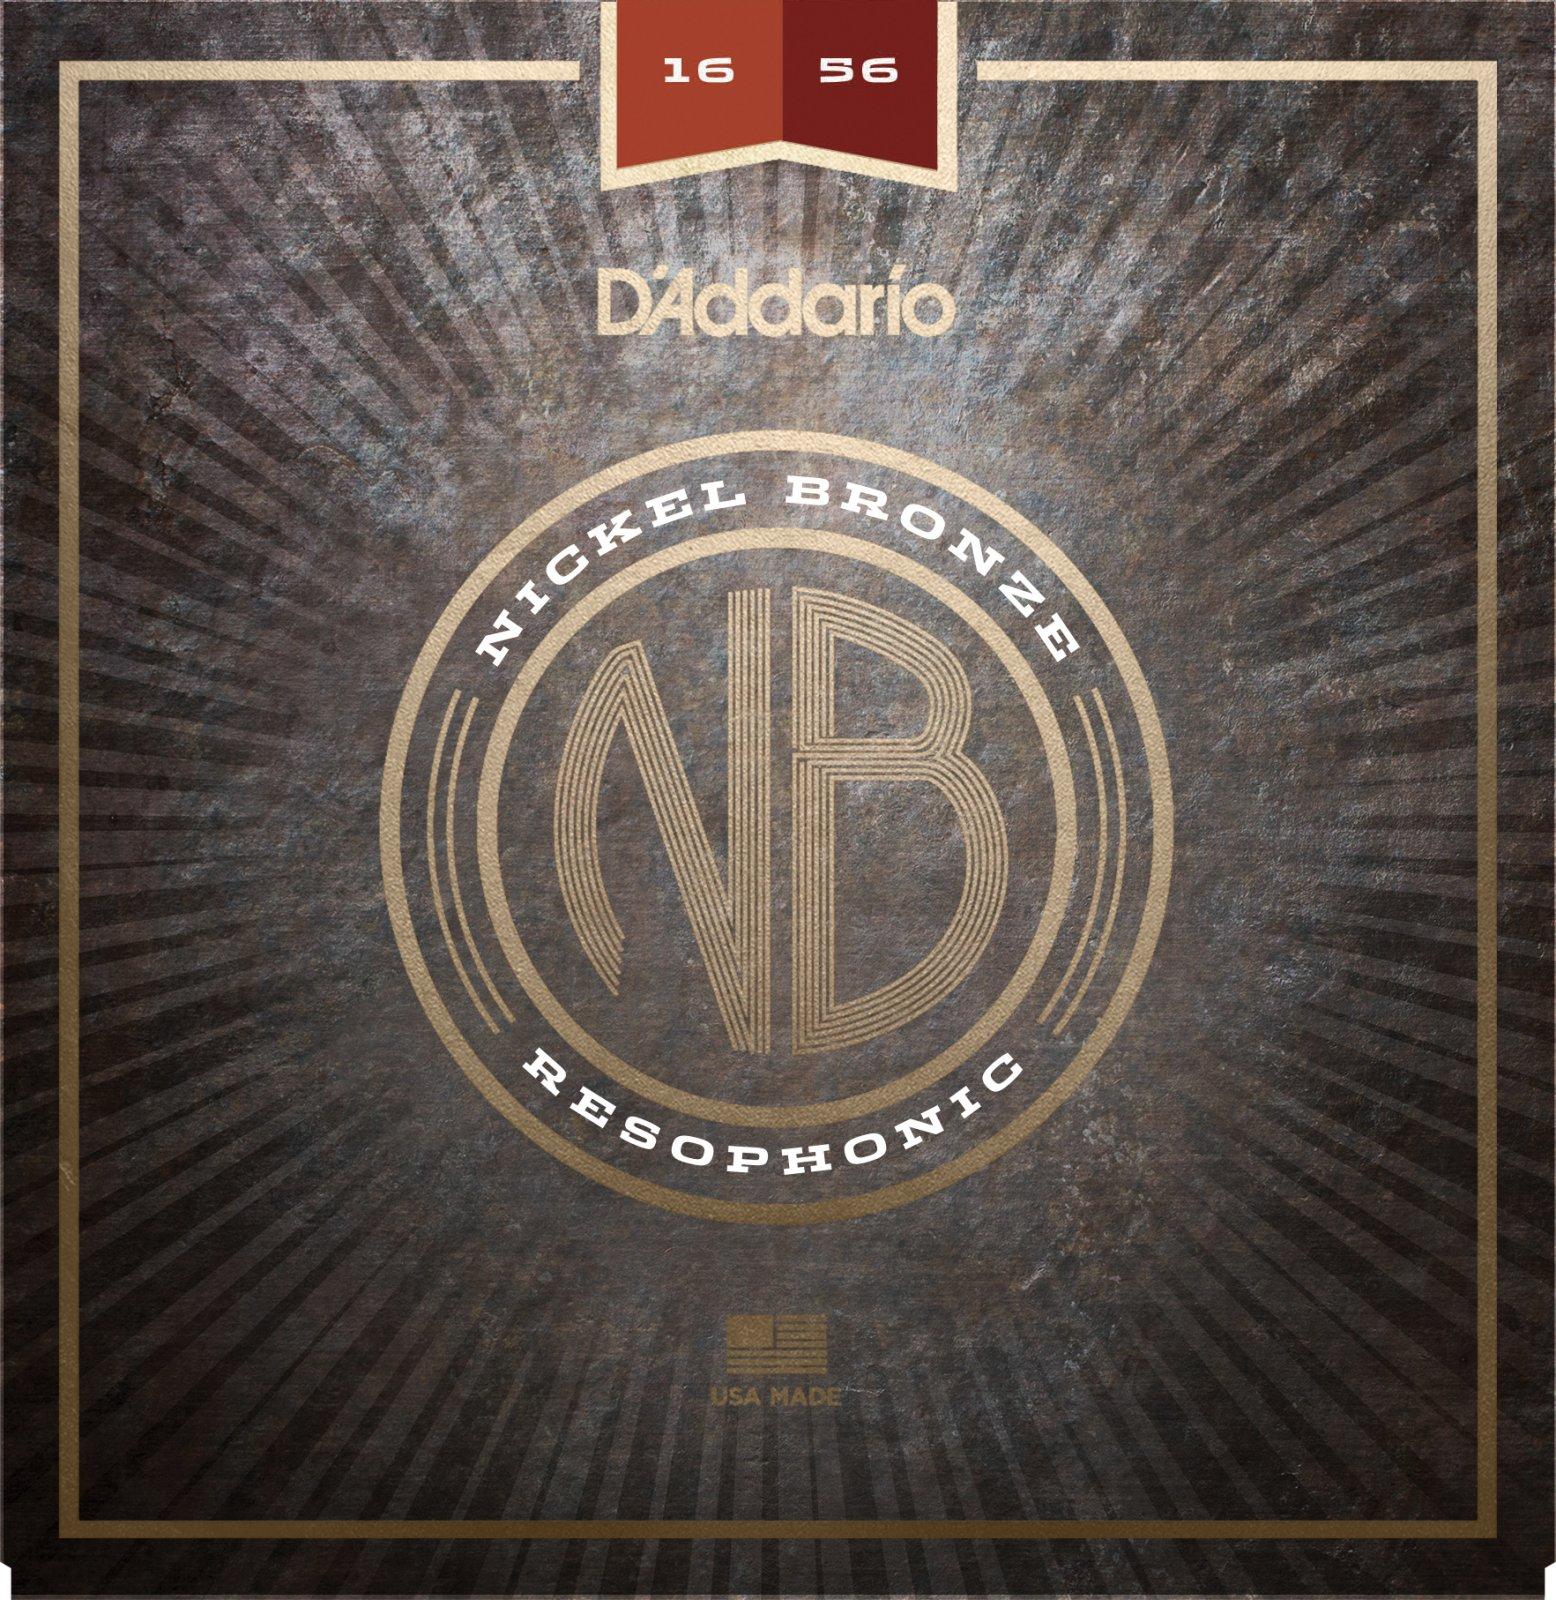 D'Addario NB1656 Nickel Bronze Acoustic Guitar Strings Resophonic 16-56